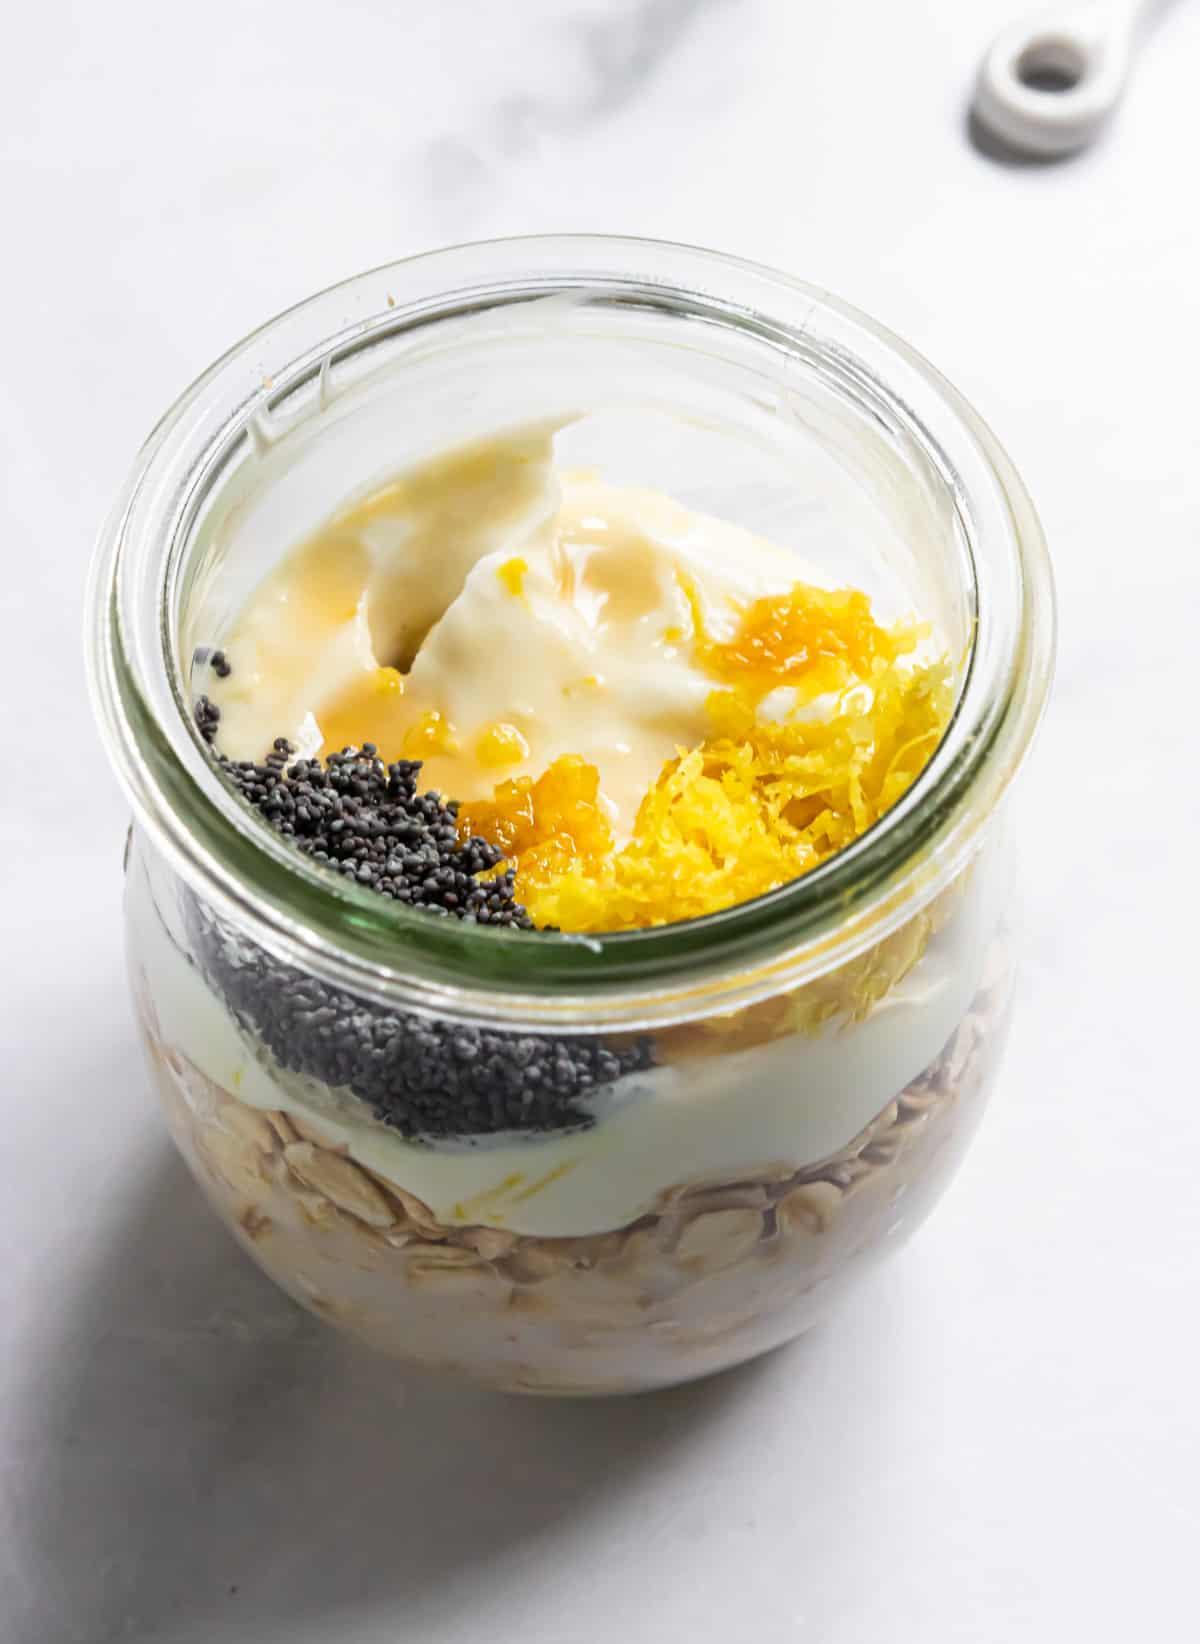 Ingredients to make oatmeal recipe in jar.